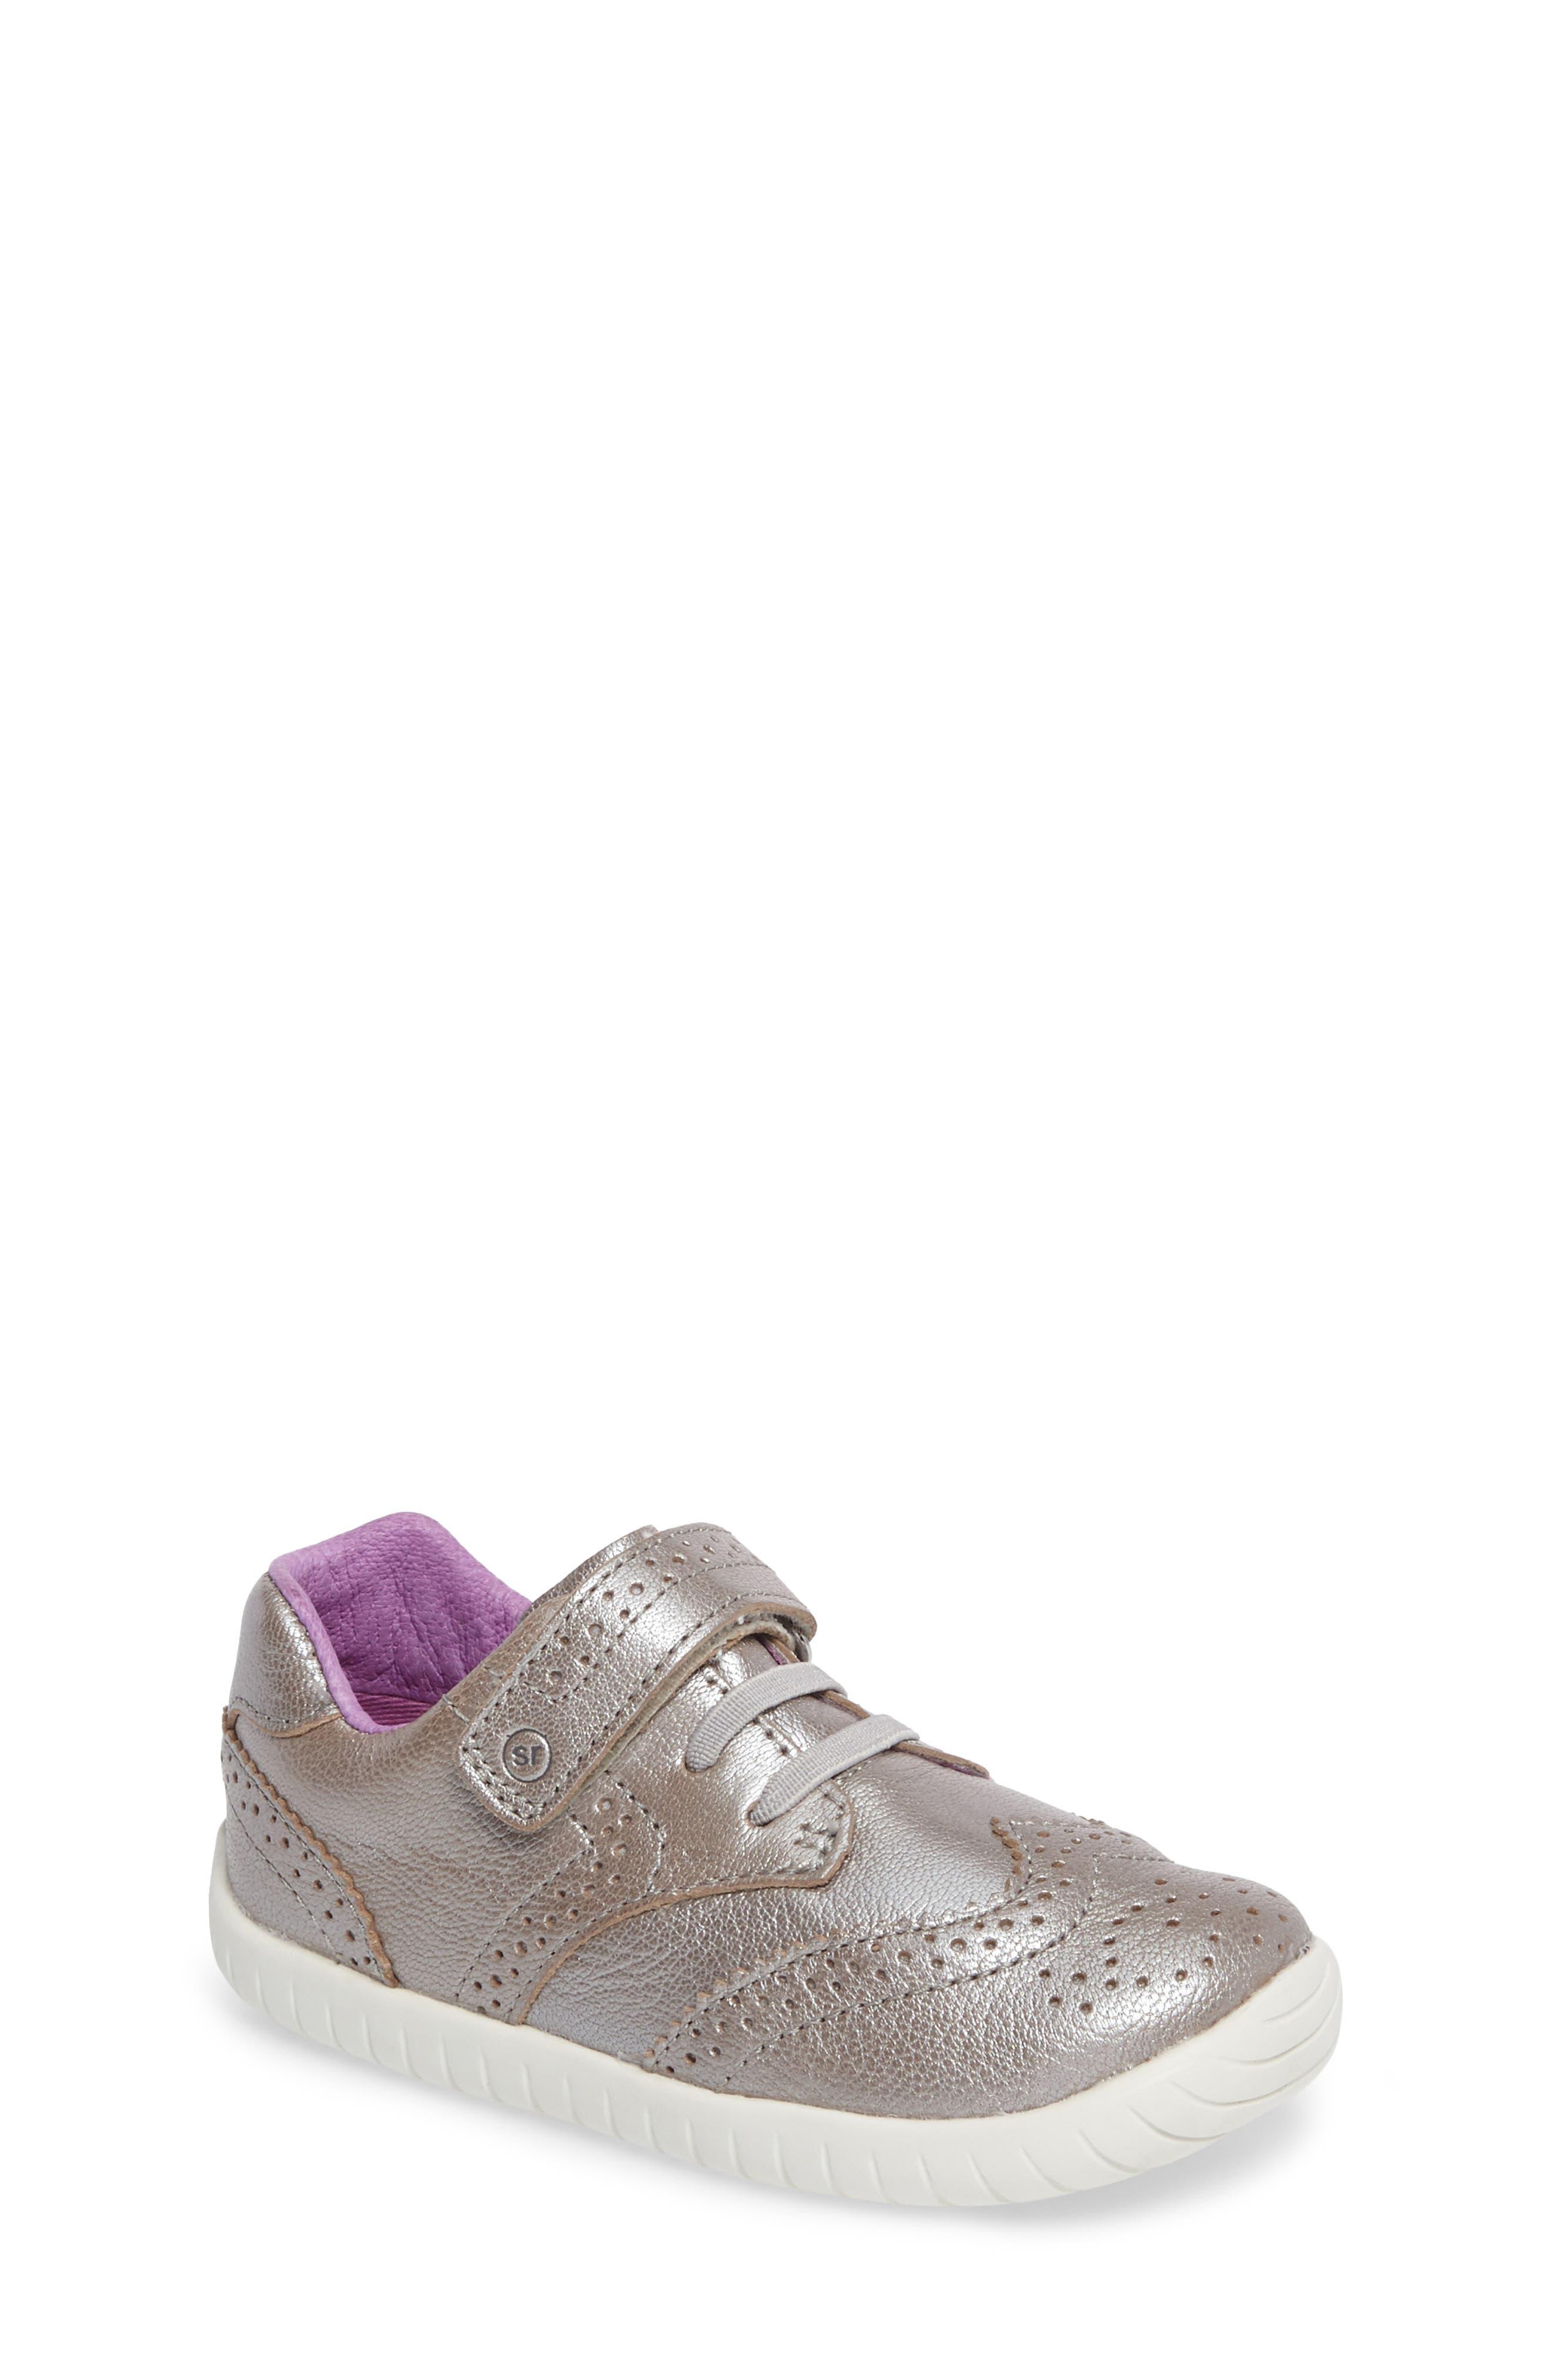 Addison Metallic Wingtip Sneaker,                         Main,                         color, 040